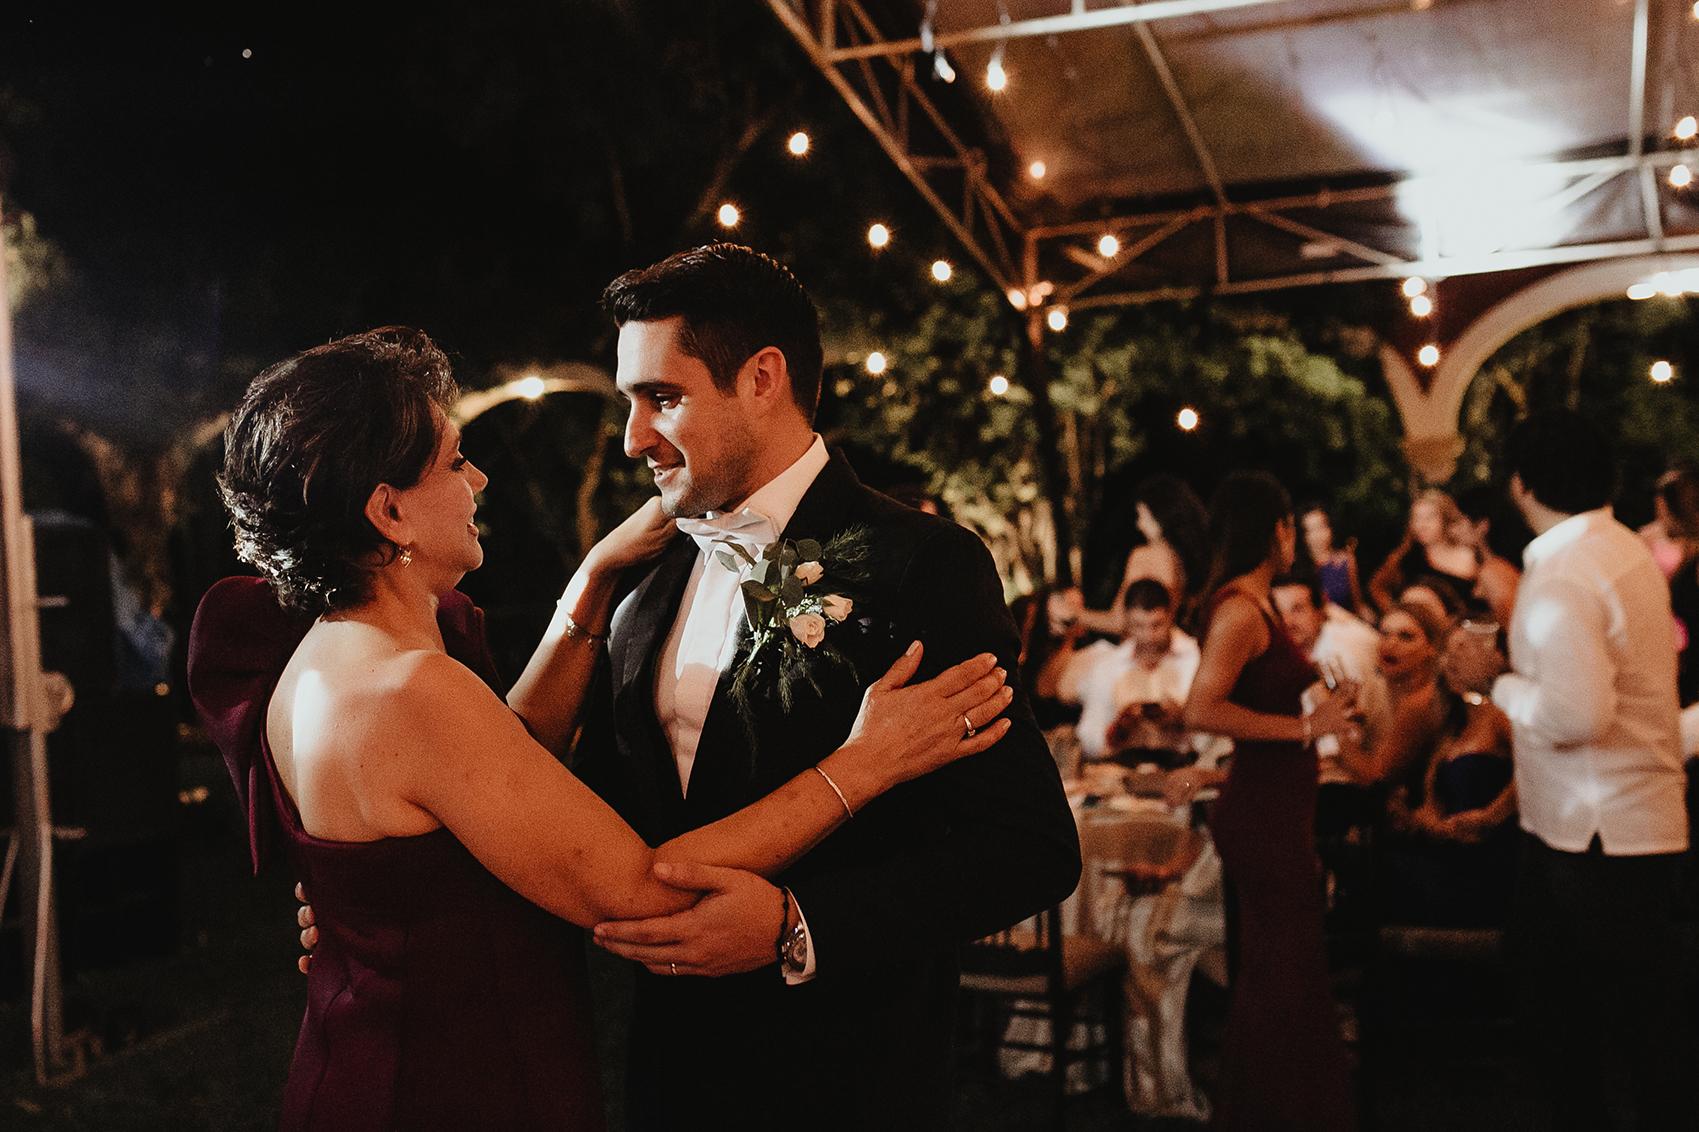 1020R&F__WeddingDestination_Weddingmerida_BodaMexico_FotografoDeBodas_FabrizioSimoneenFotografo.jpg